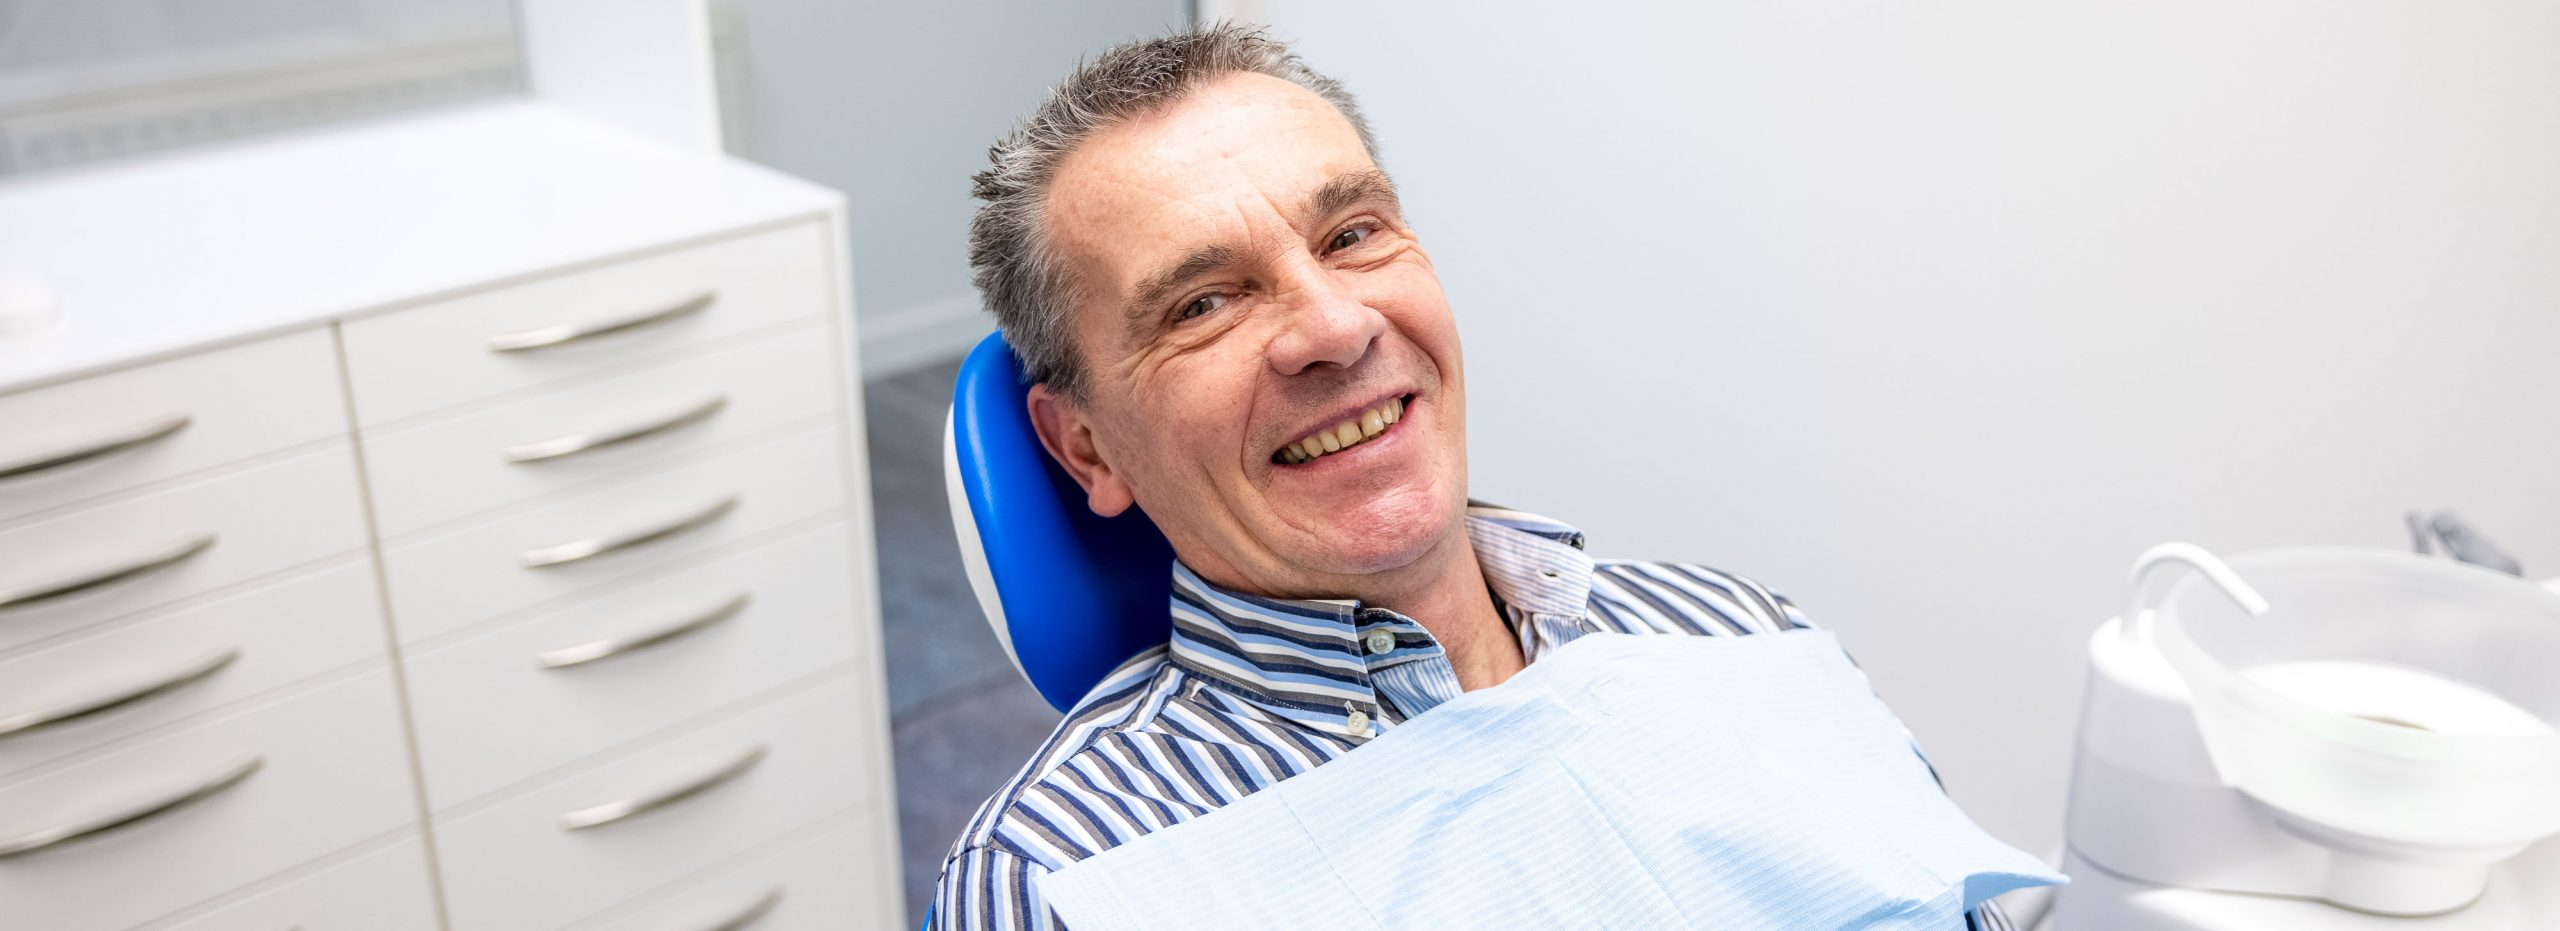 Tandartspraktijk hoflaan tandartsen 11 scaled